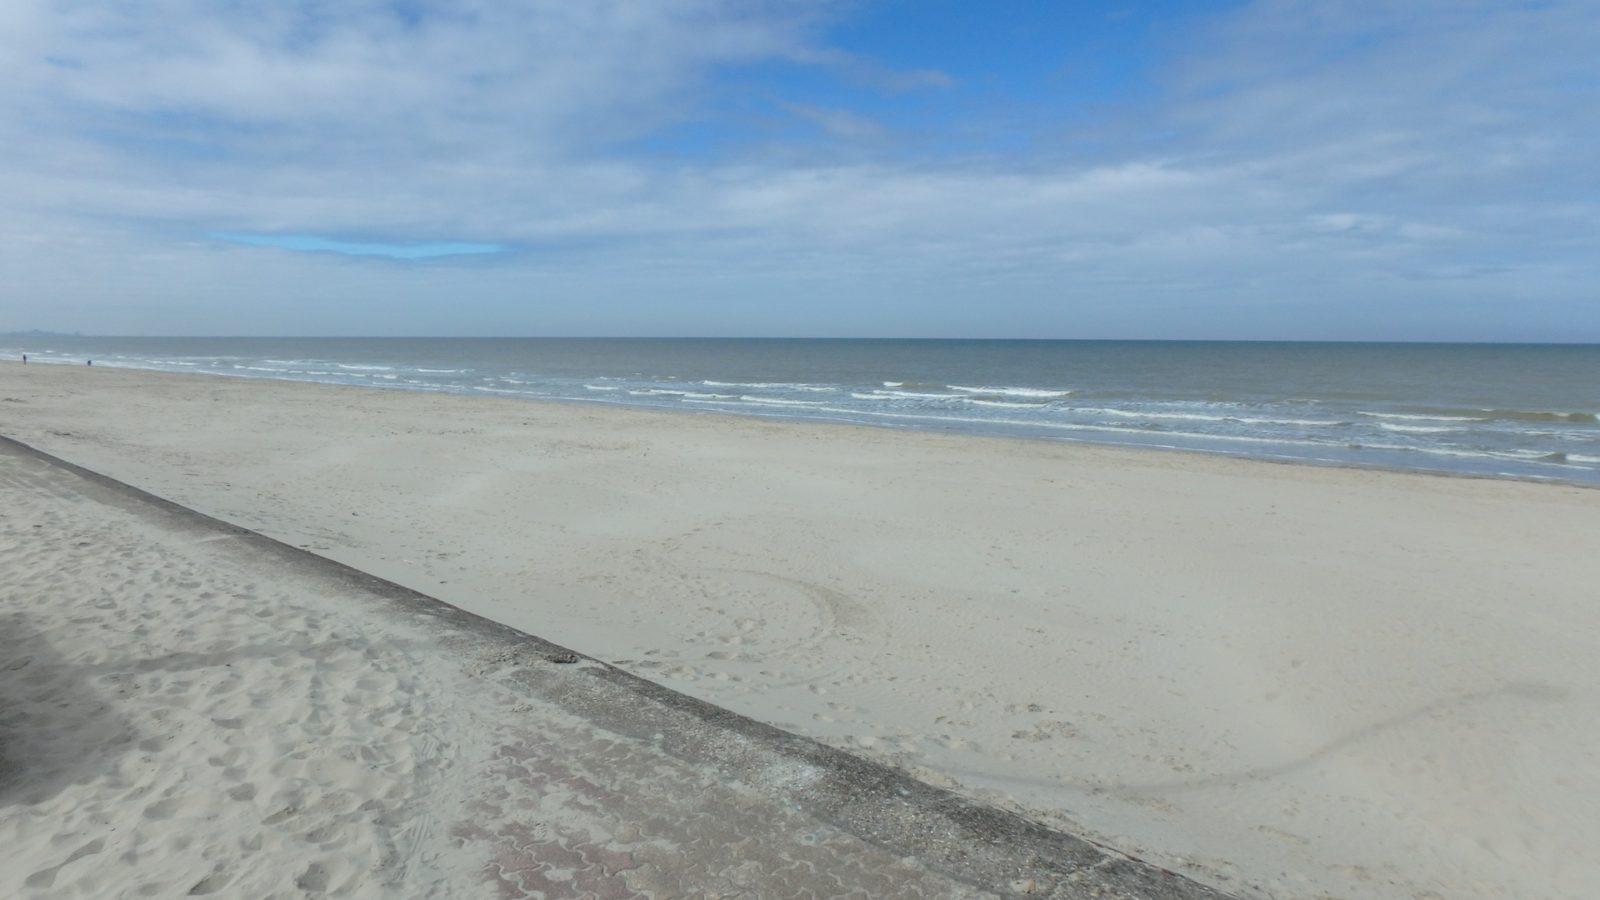 Plage de Bray dunes